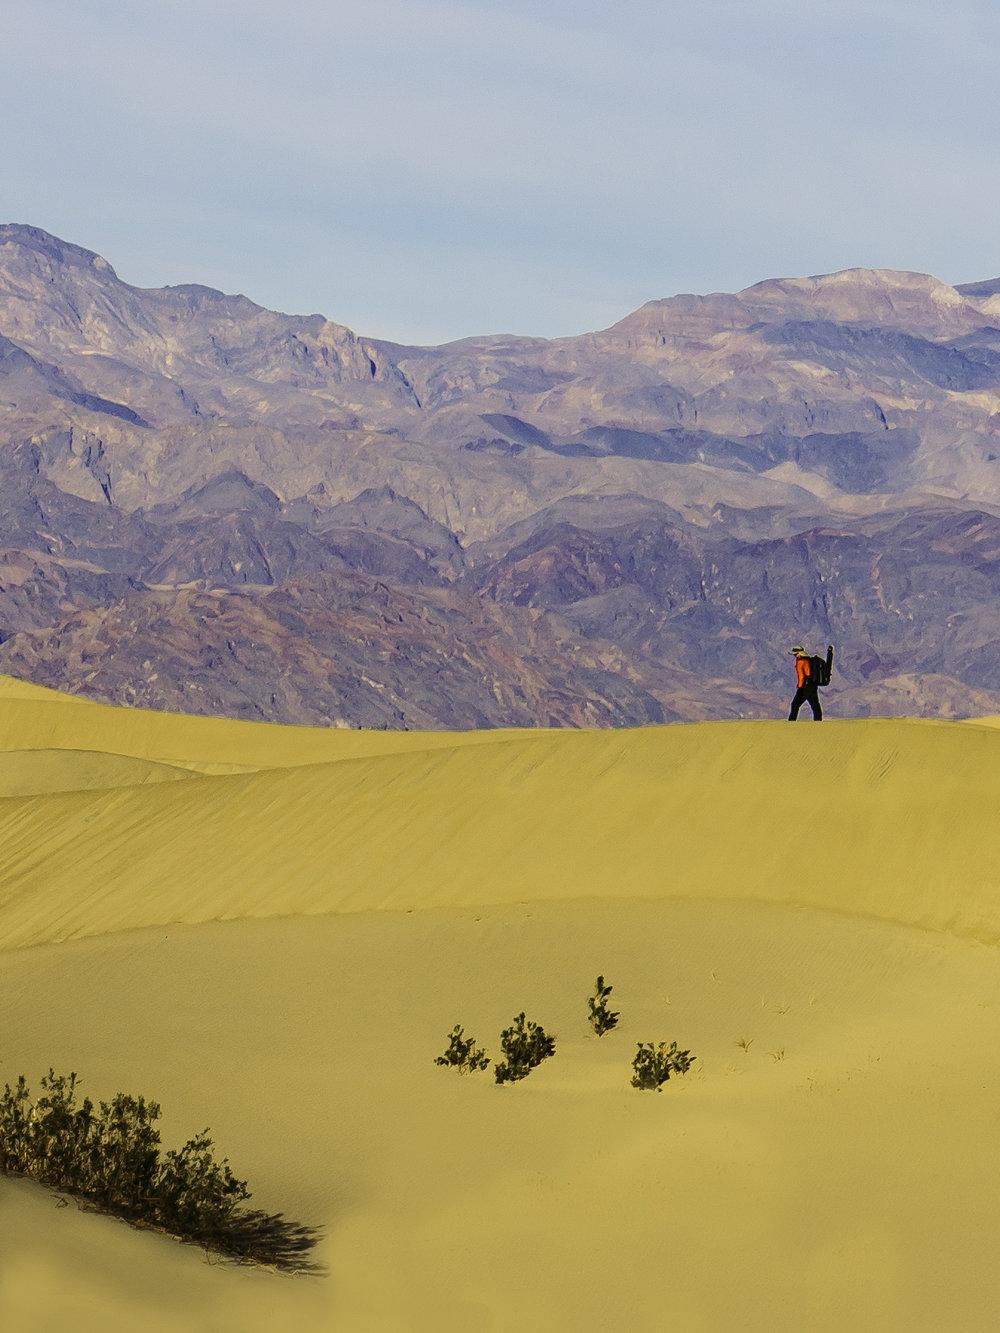 United States - Death Valley